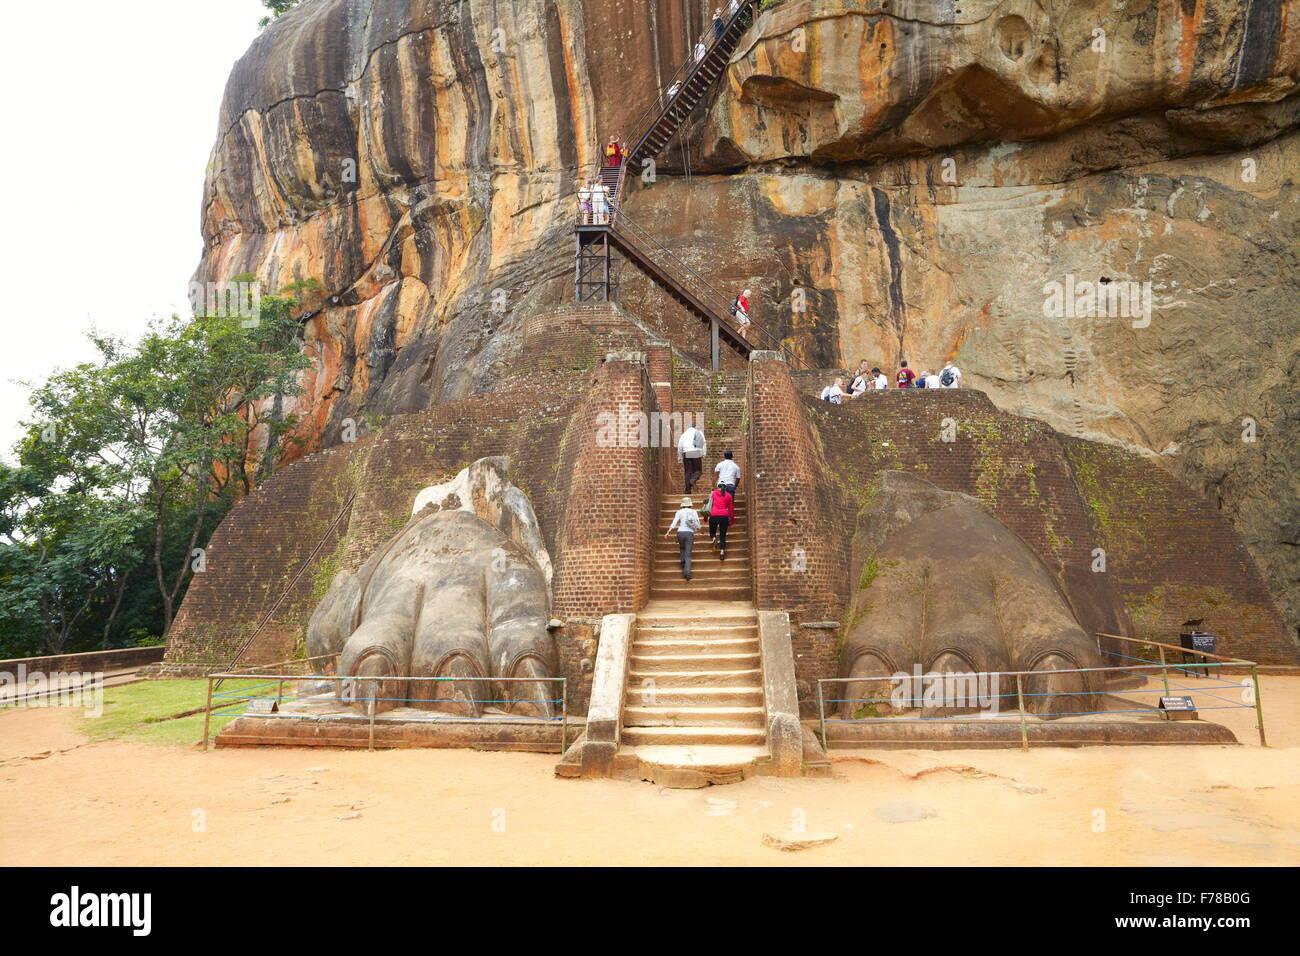 Sri Lanka - Sigiriya, Lion's Gate, ancient fortress, UNESCO World Heritage Site - Stock Image